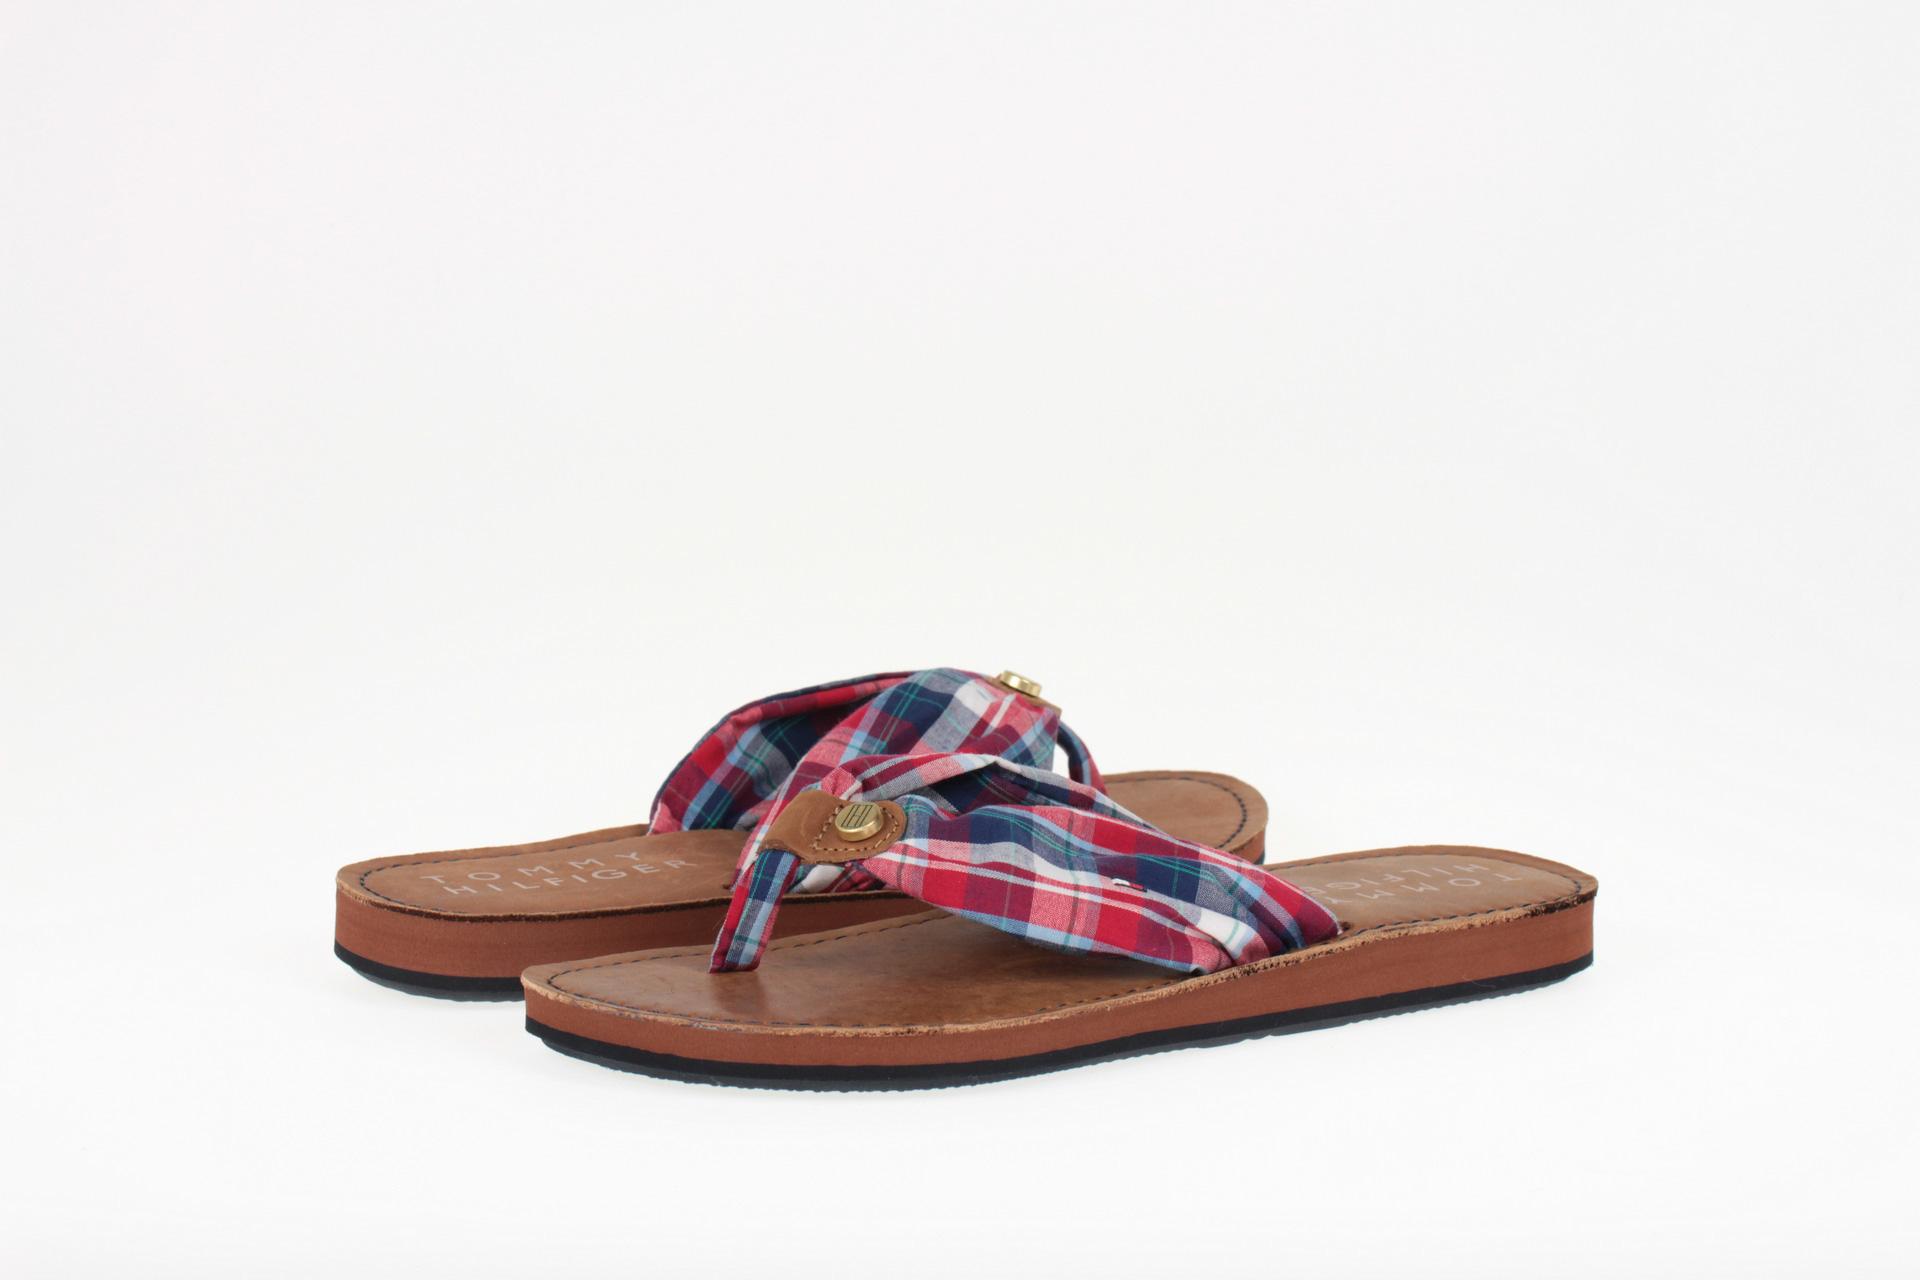 Tommy Hilfiger Papucs - Monica 6 B - 13s-5522-214 - Office Shoes ... 4a76226944